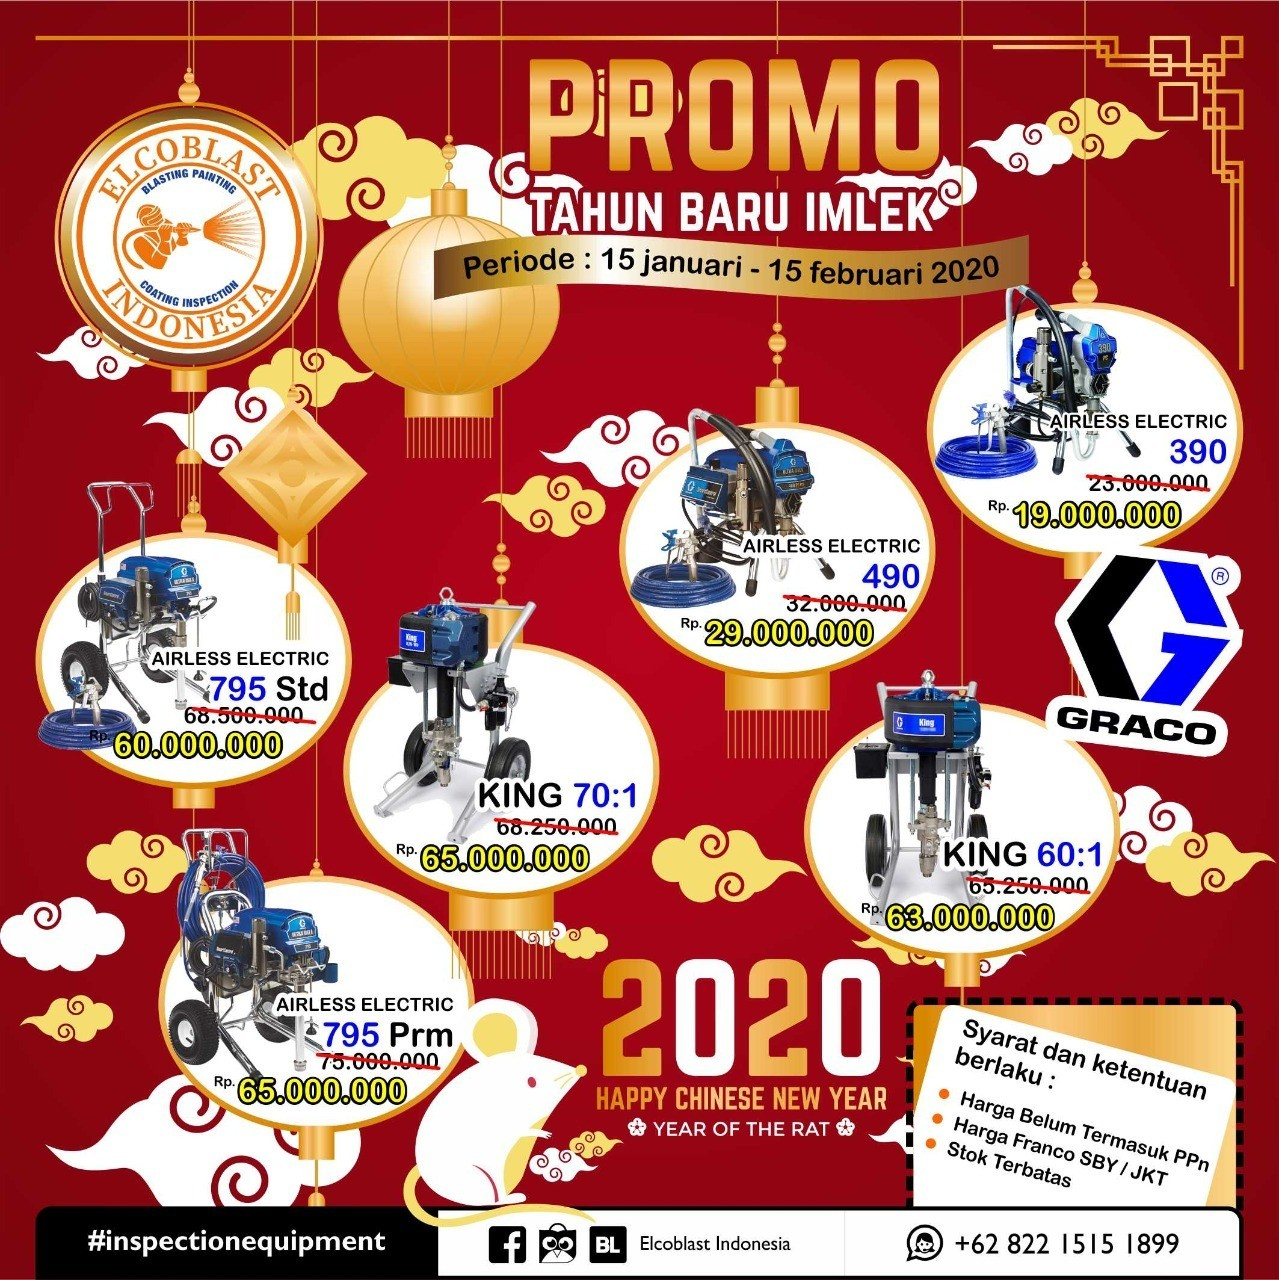 Promo Imlek 2020 – Diskon Besar Elcometer & Graco